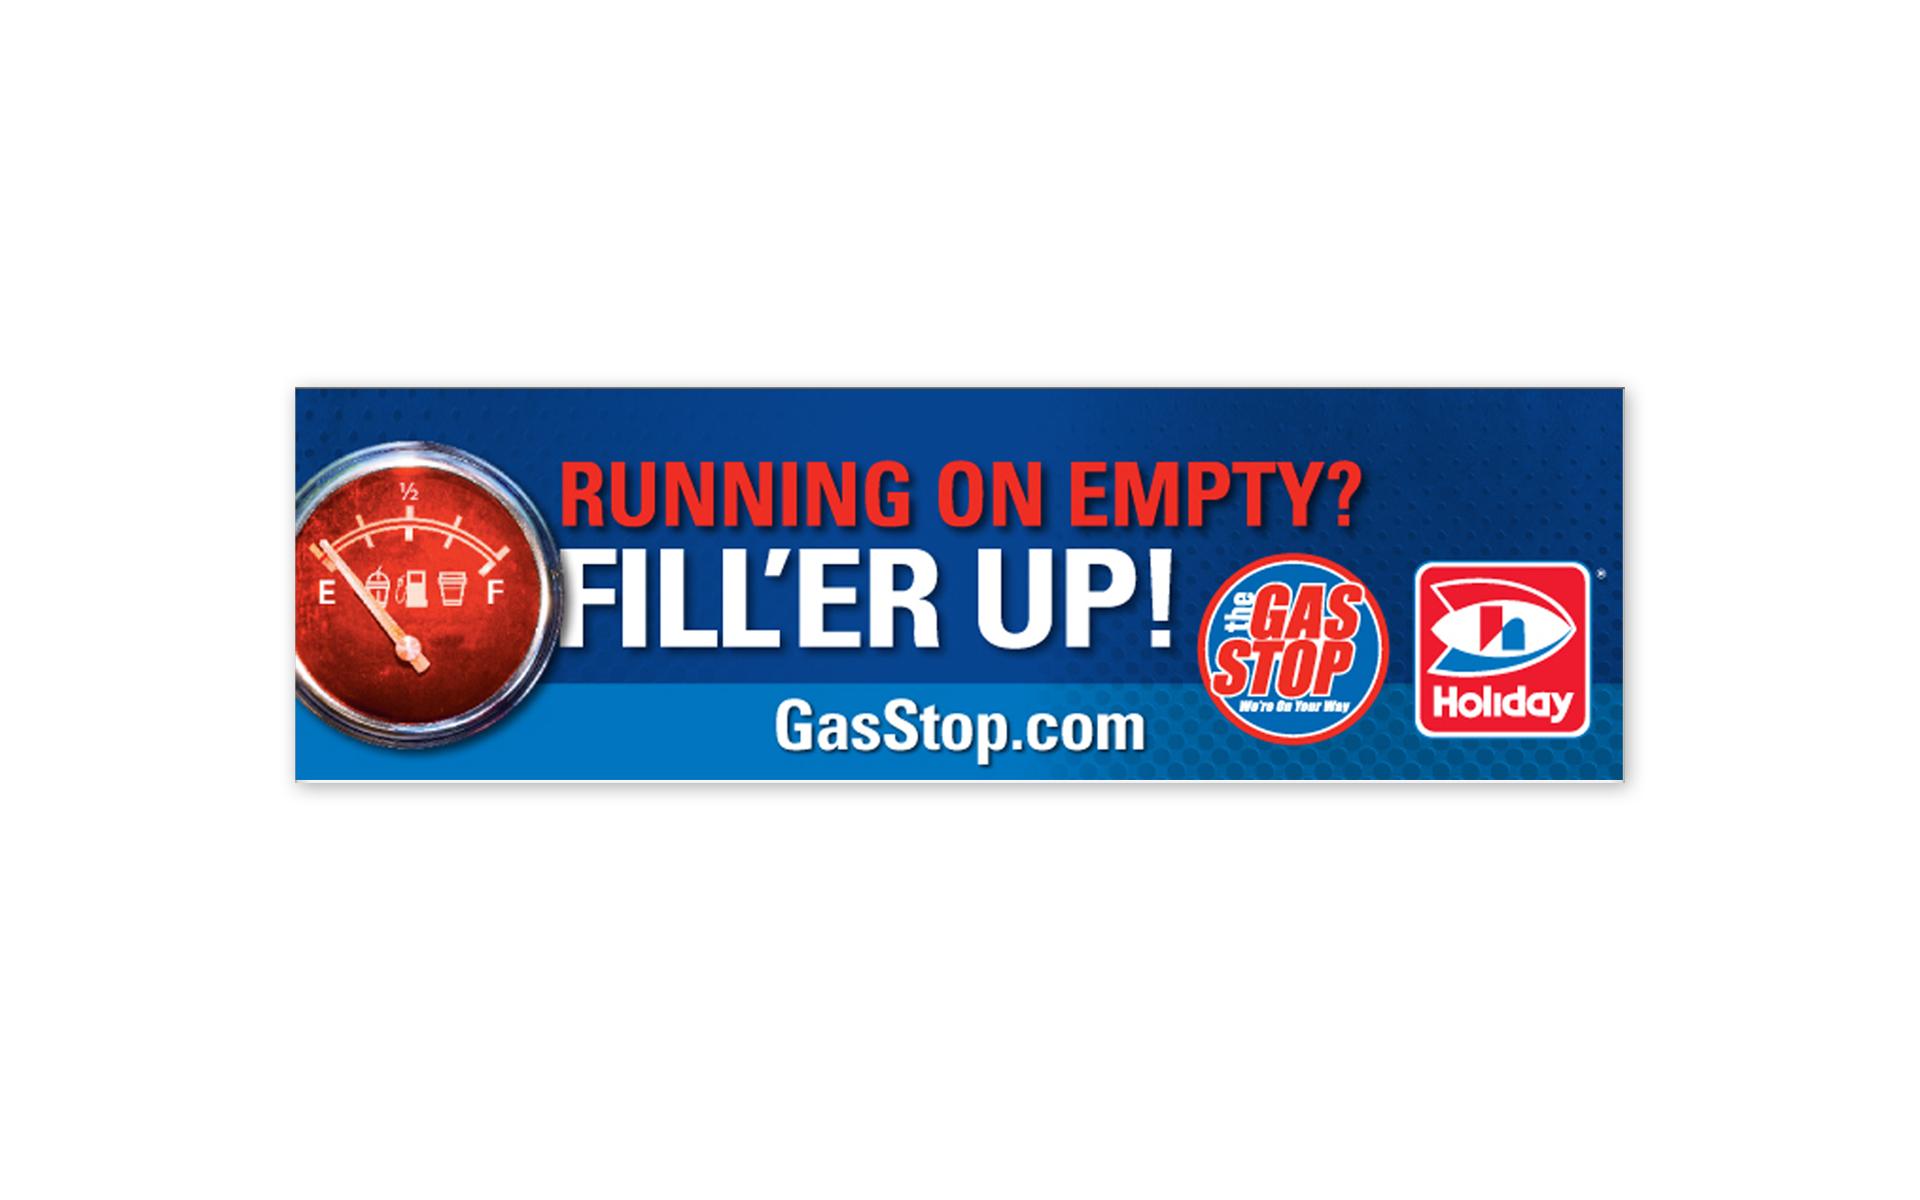 Gas Stop_DigitalBillboard_tile4